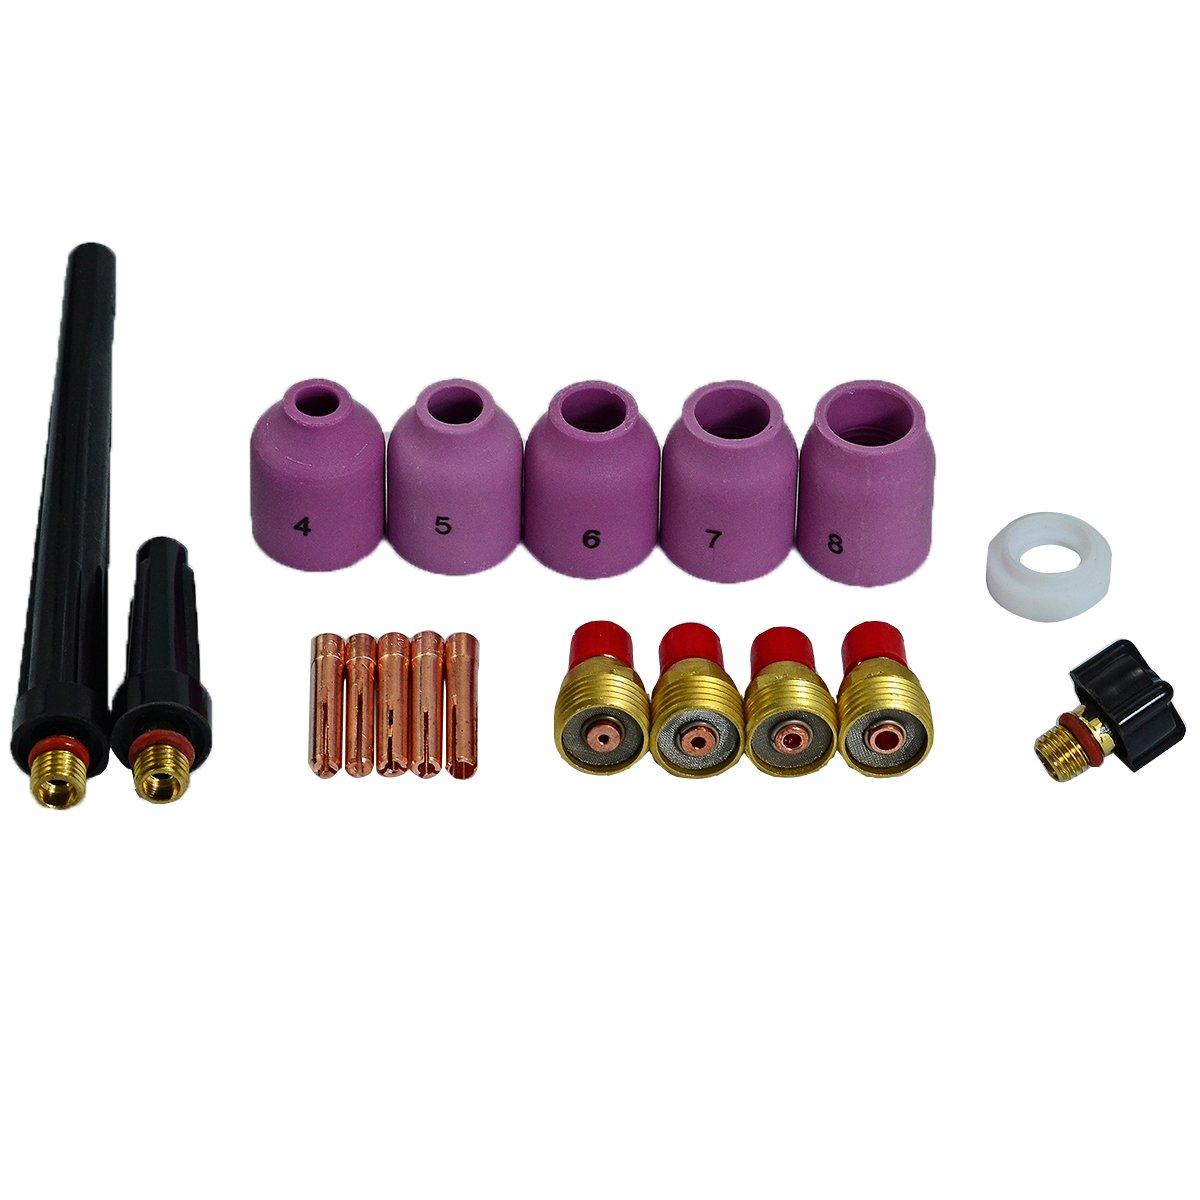 TIG Alumina Nozzle Gas Lens Collets Bodies Gasket Cup Back Caps Assorted Size Fit PTA DB SR 9 20 25 TIG Welding Torch 18pcs RIVERWELDstore WP-9 WP-20 WP-25